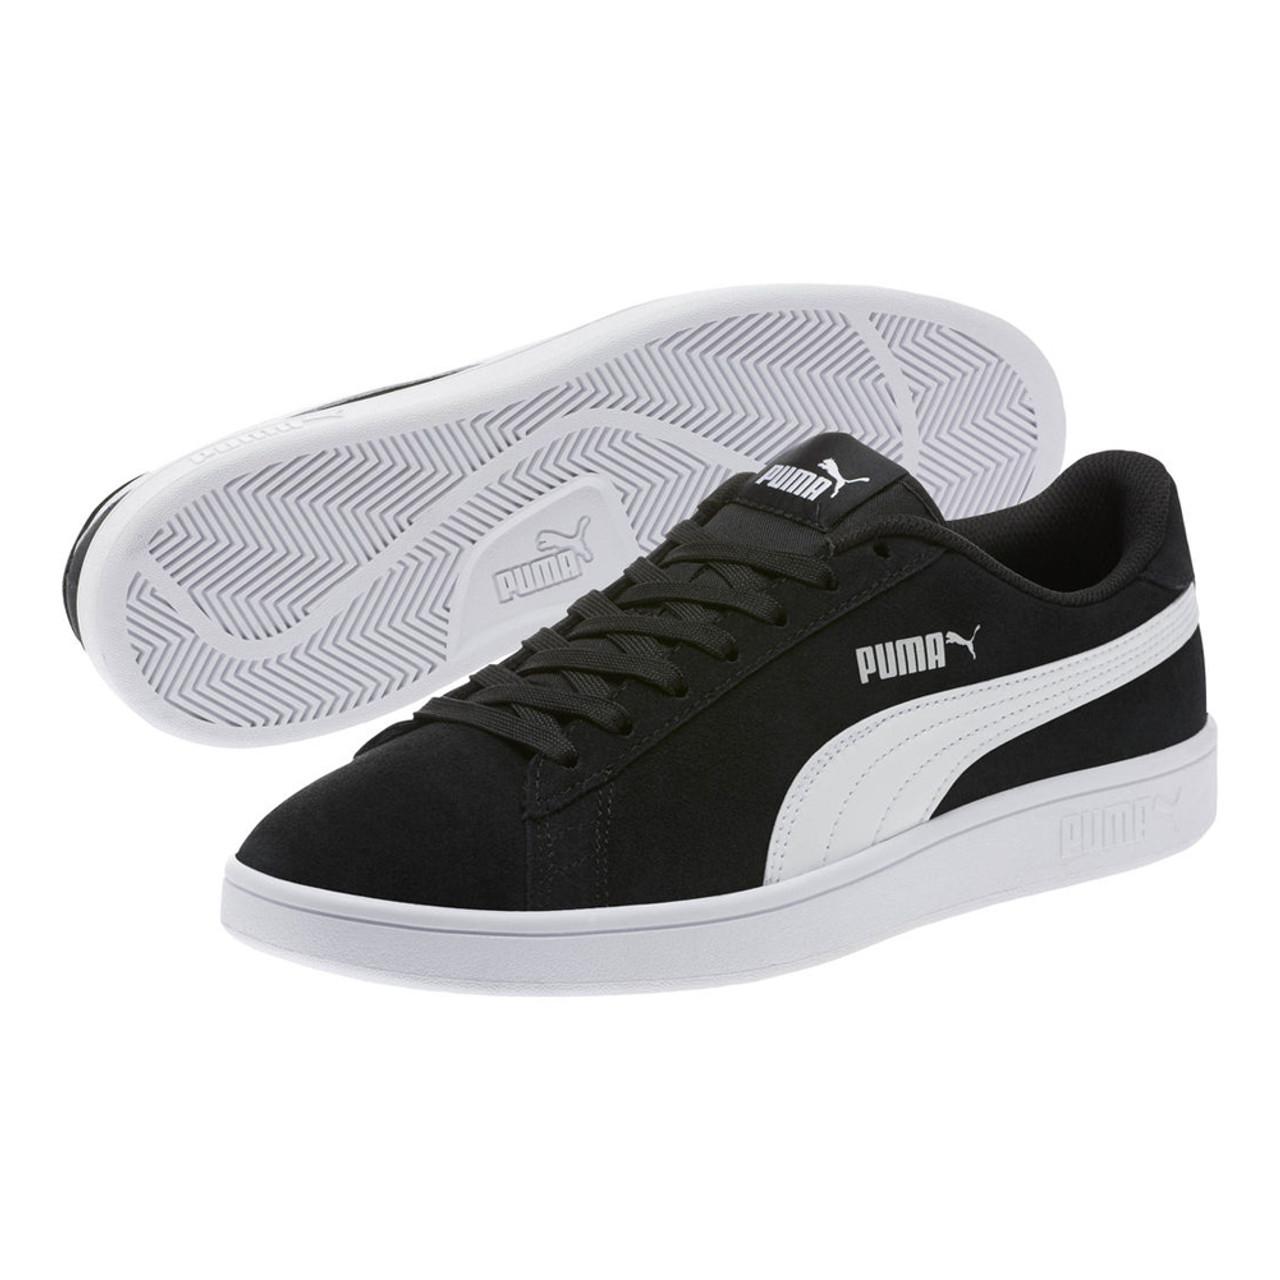 Puma Men's Puma Smash V2 Sneaker BlackWhiteSilver